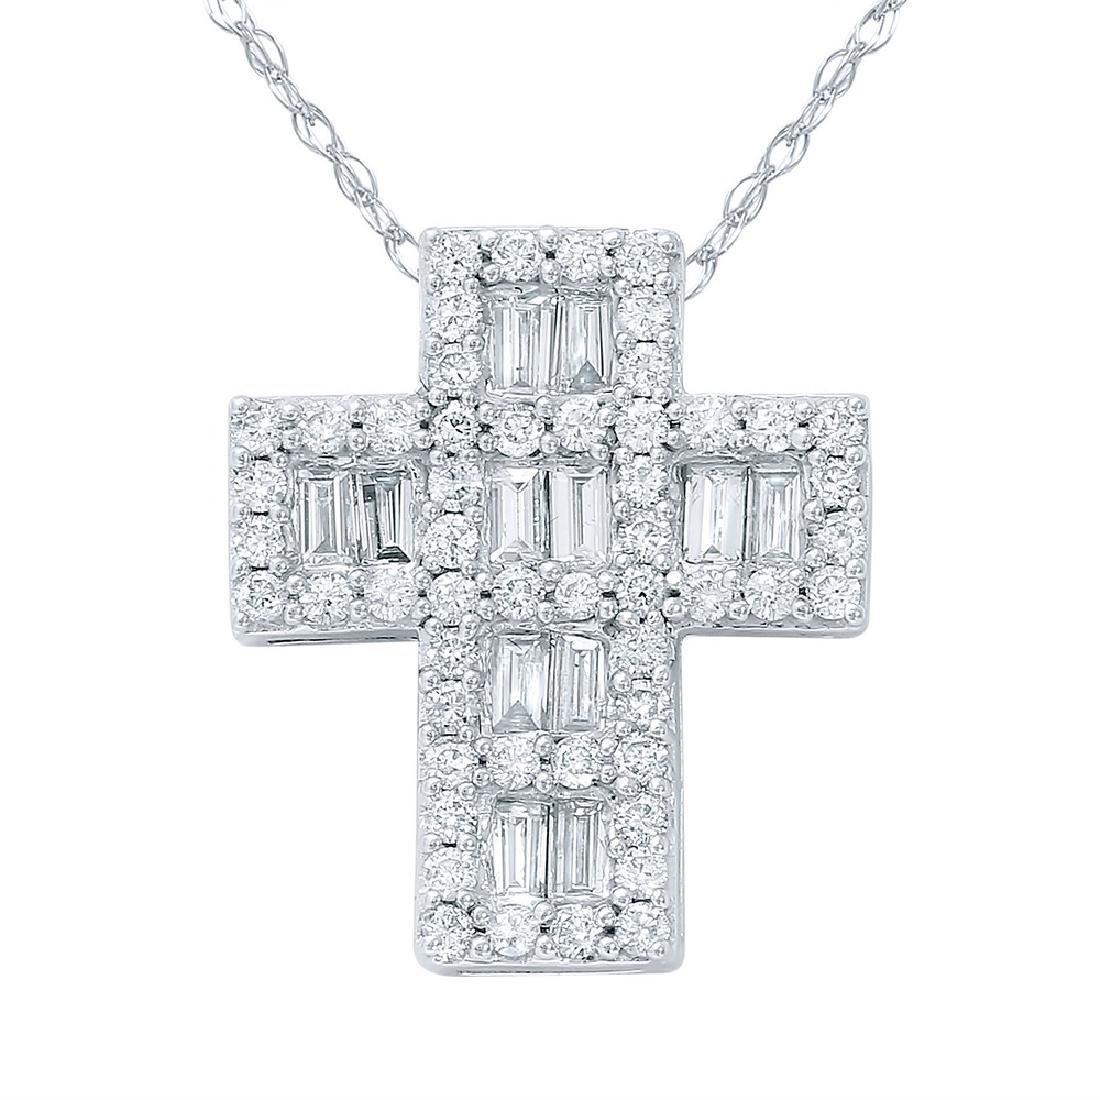 Genuine 1 TCW 14K White Gold Ladies Necklace